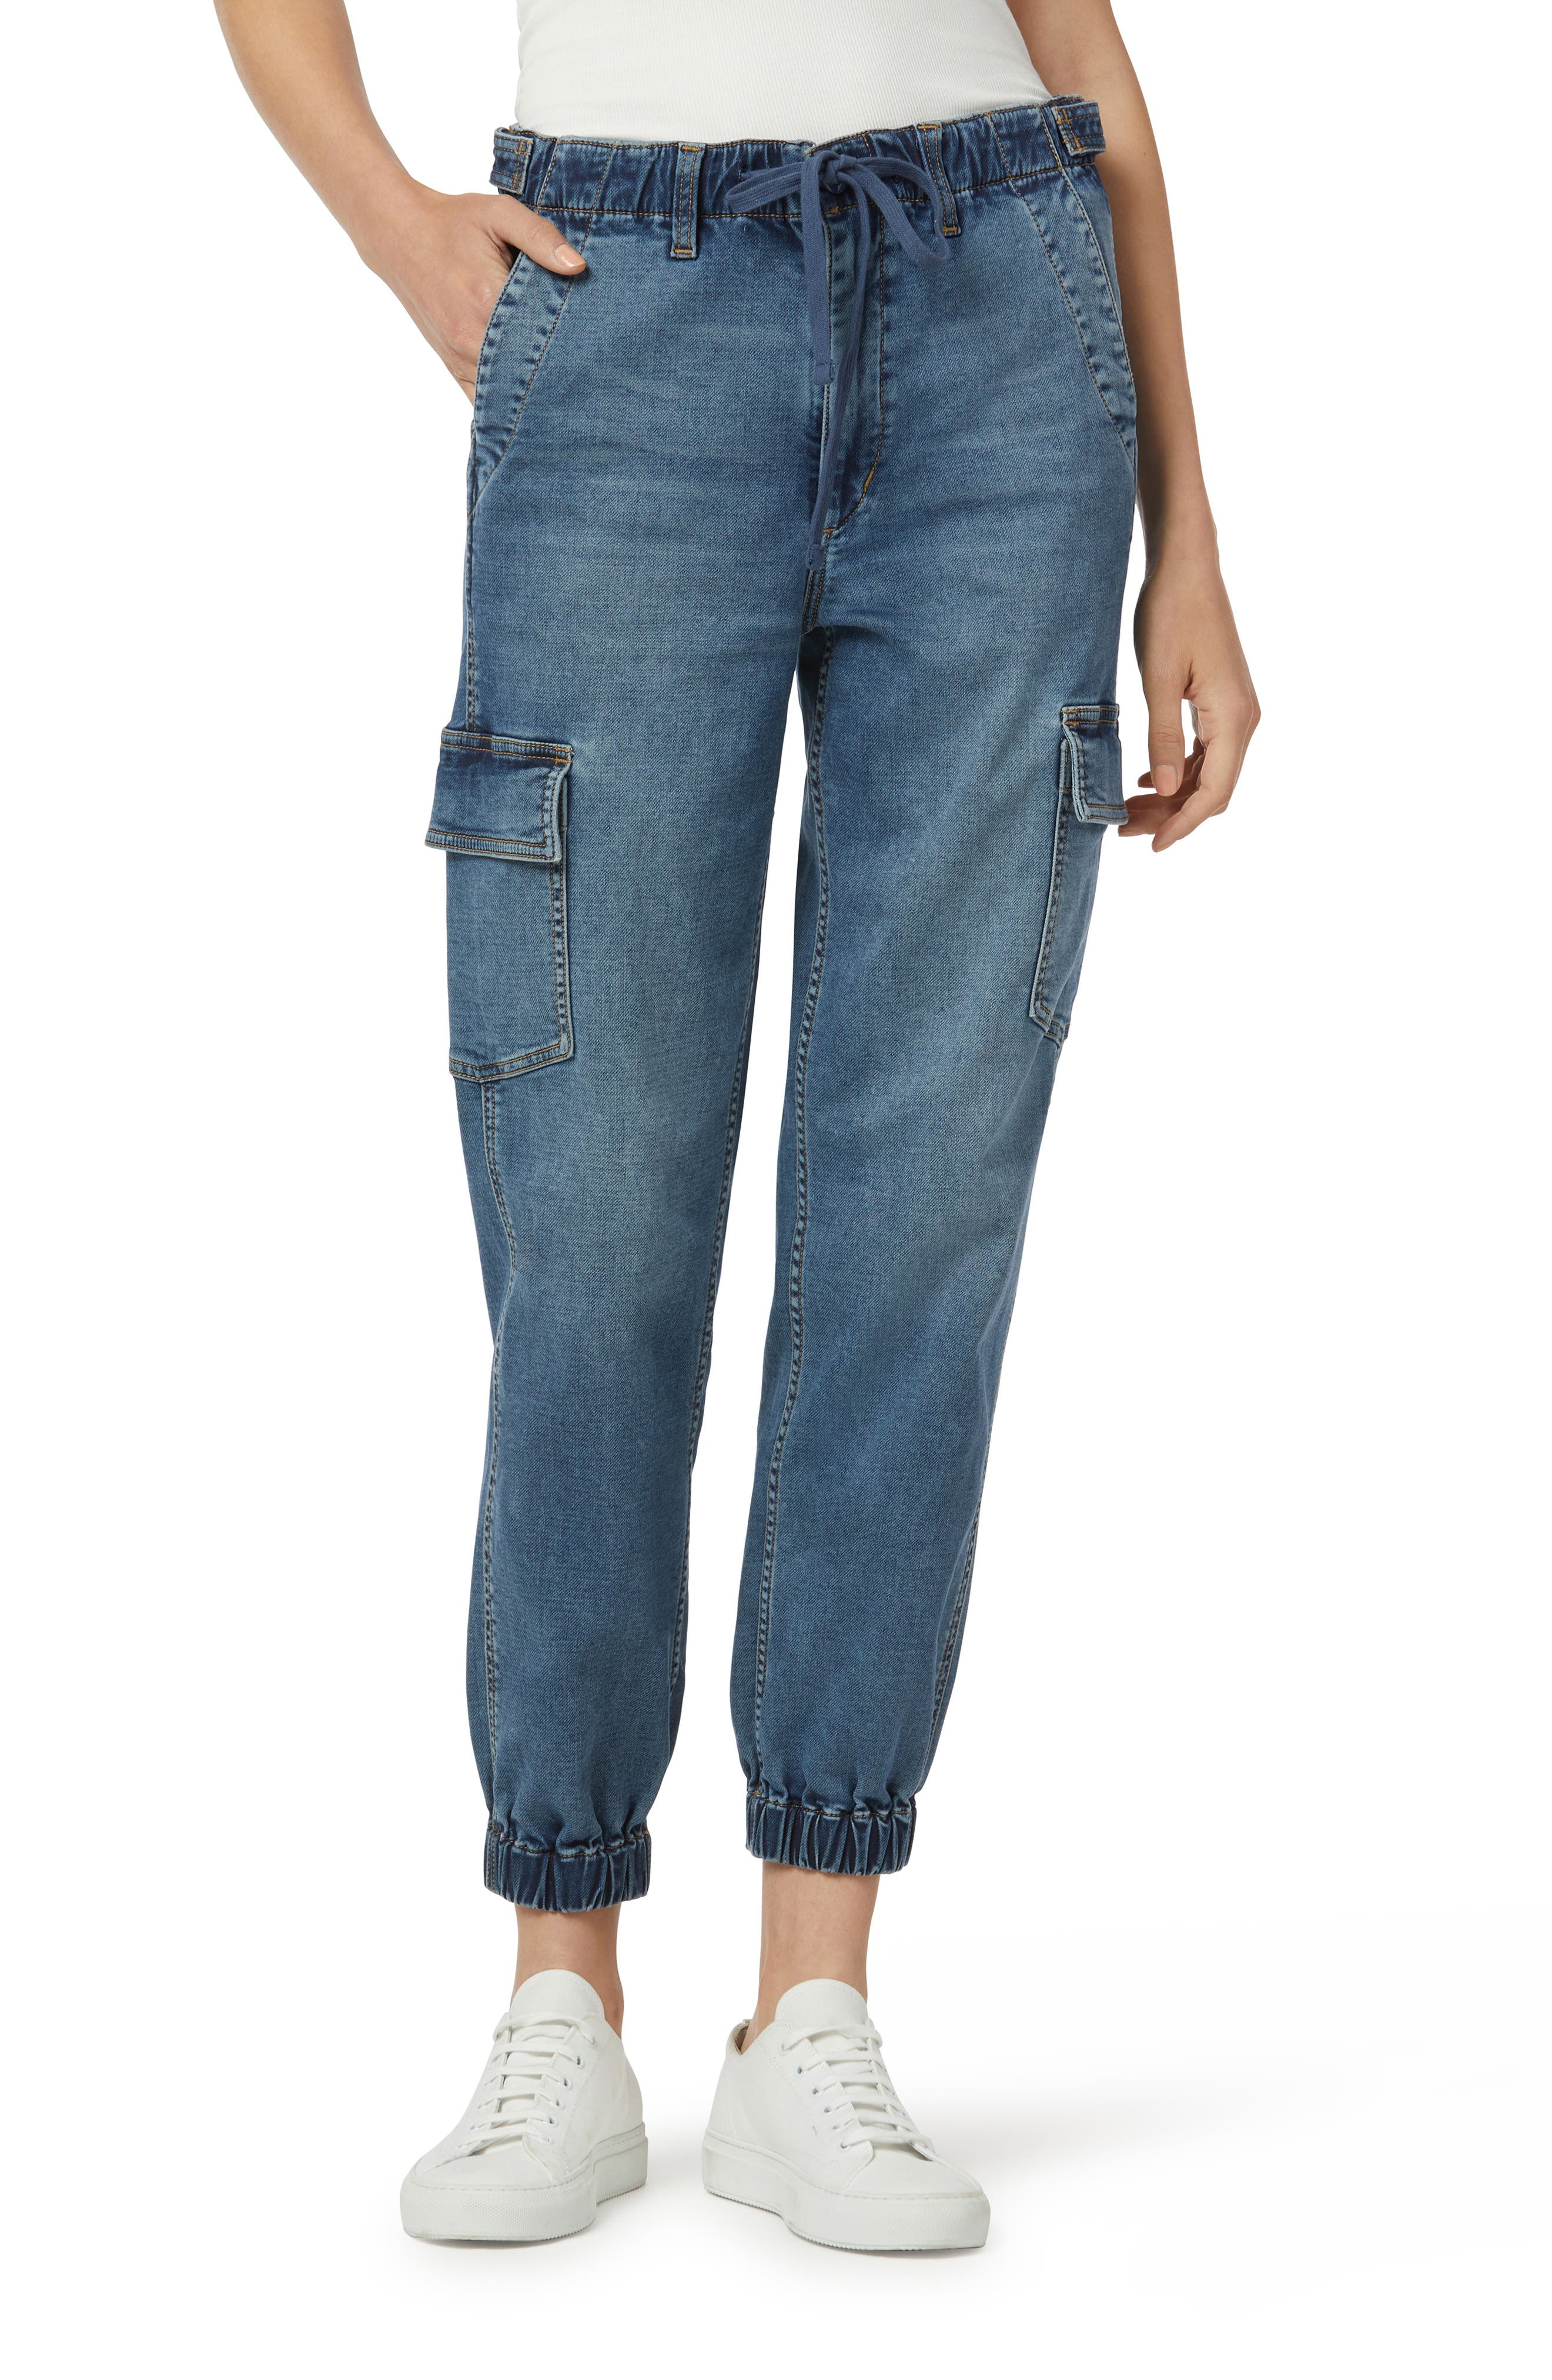 The Miranda Jogger Jeans